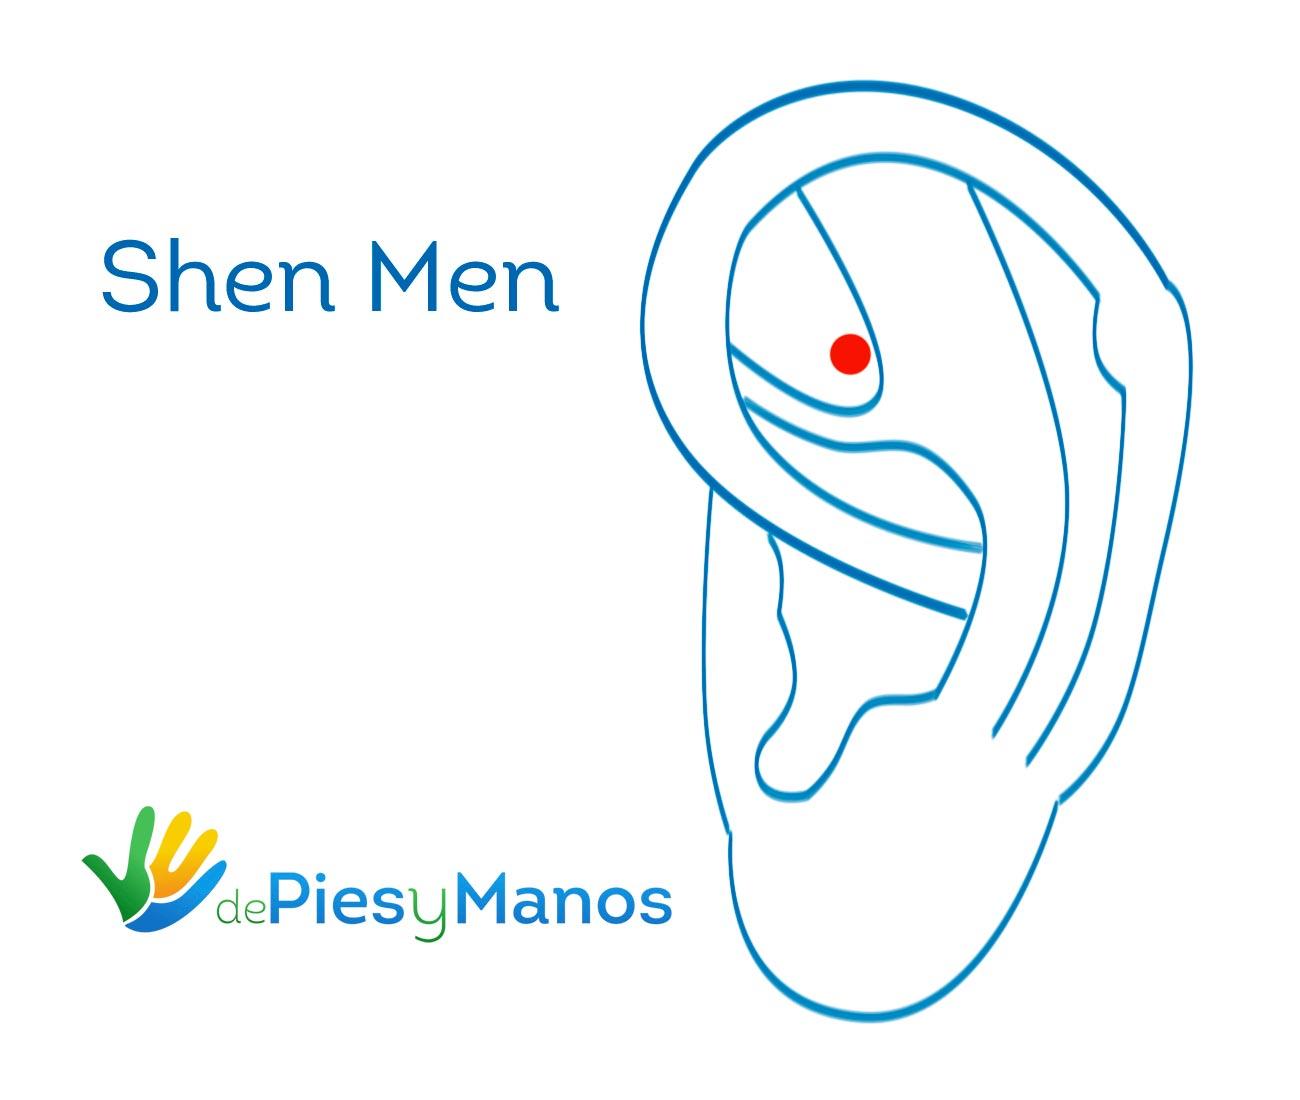 Shen Men